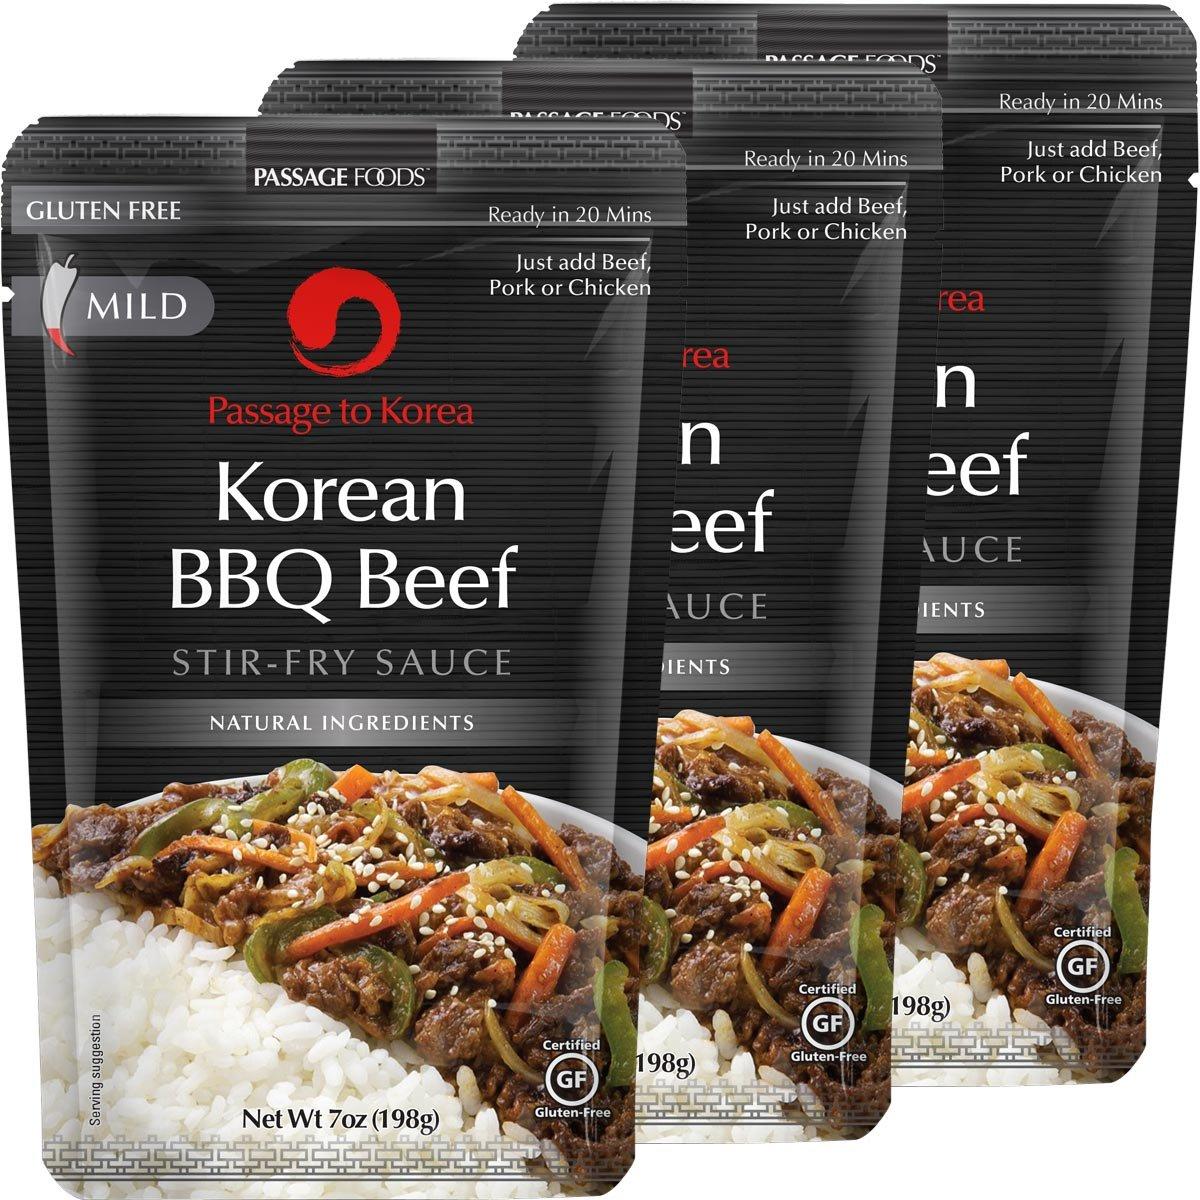 Passage Foods To Korea, Korean Bbq Beef Stir Fry Sauce, 7 Ounce, 3 Count